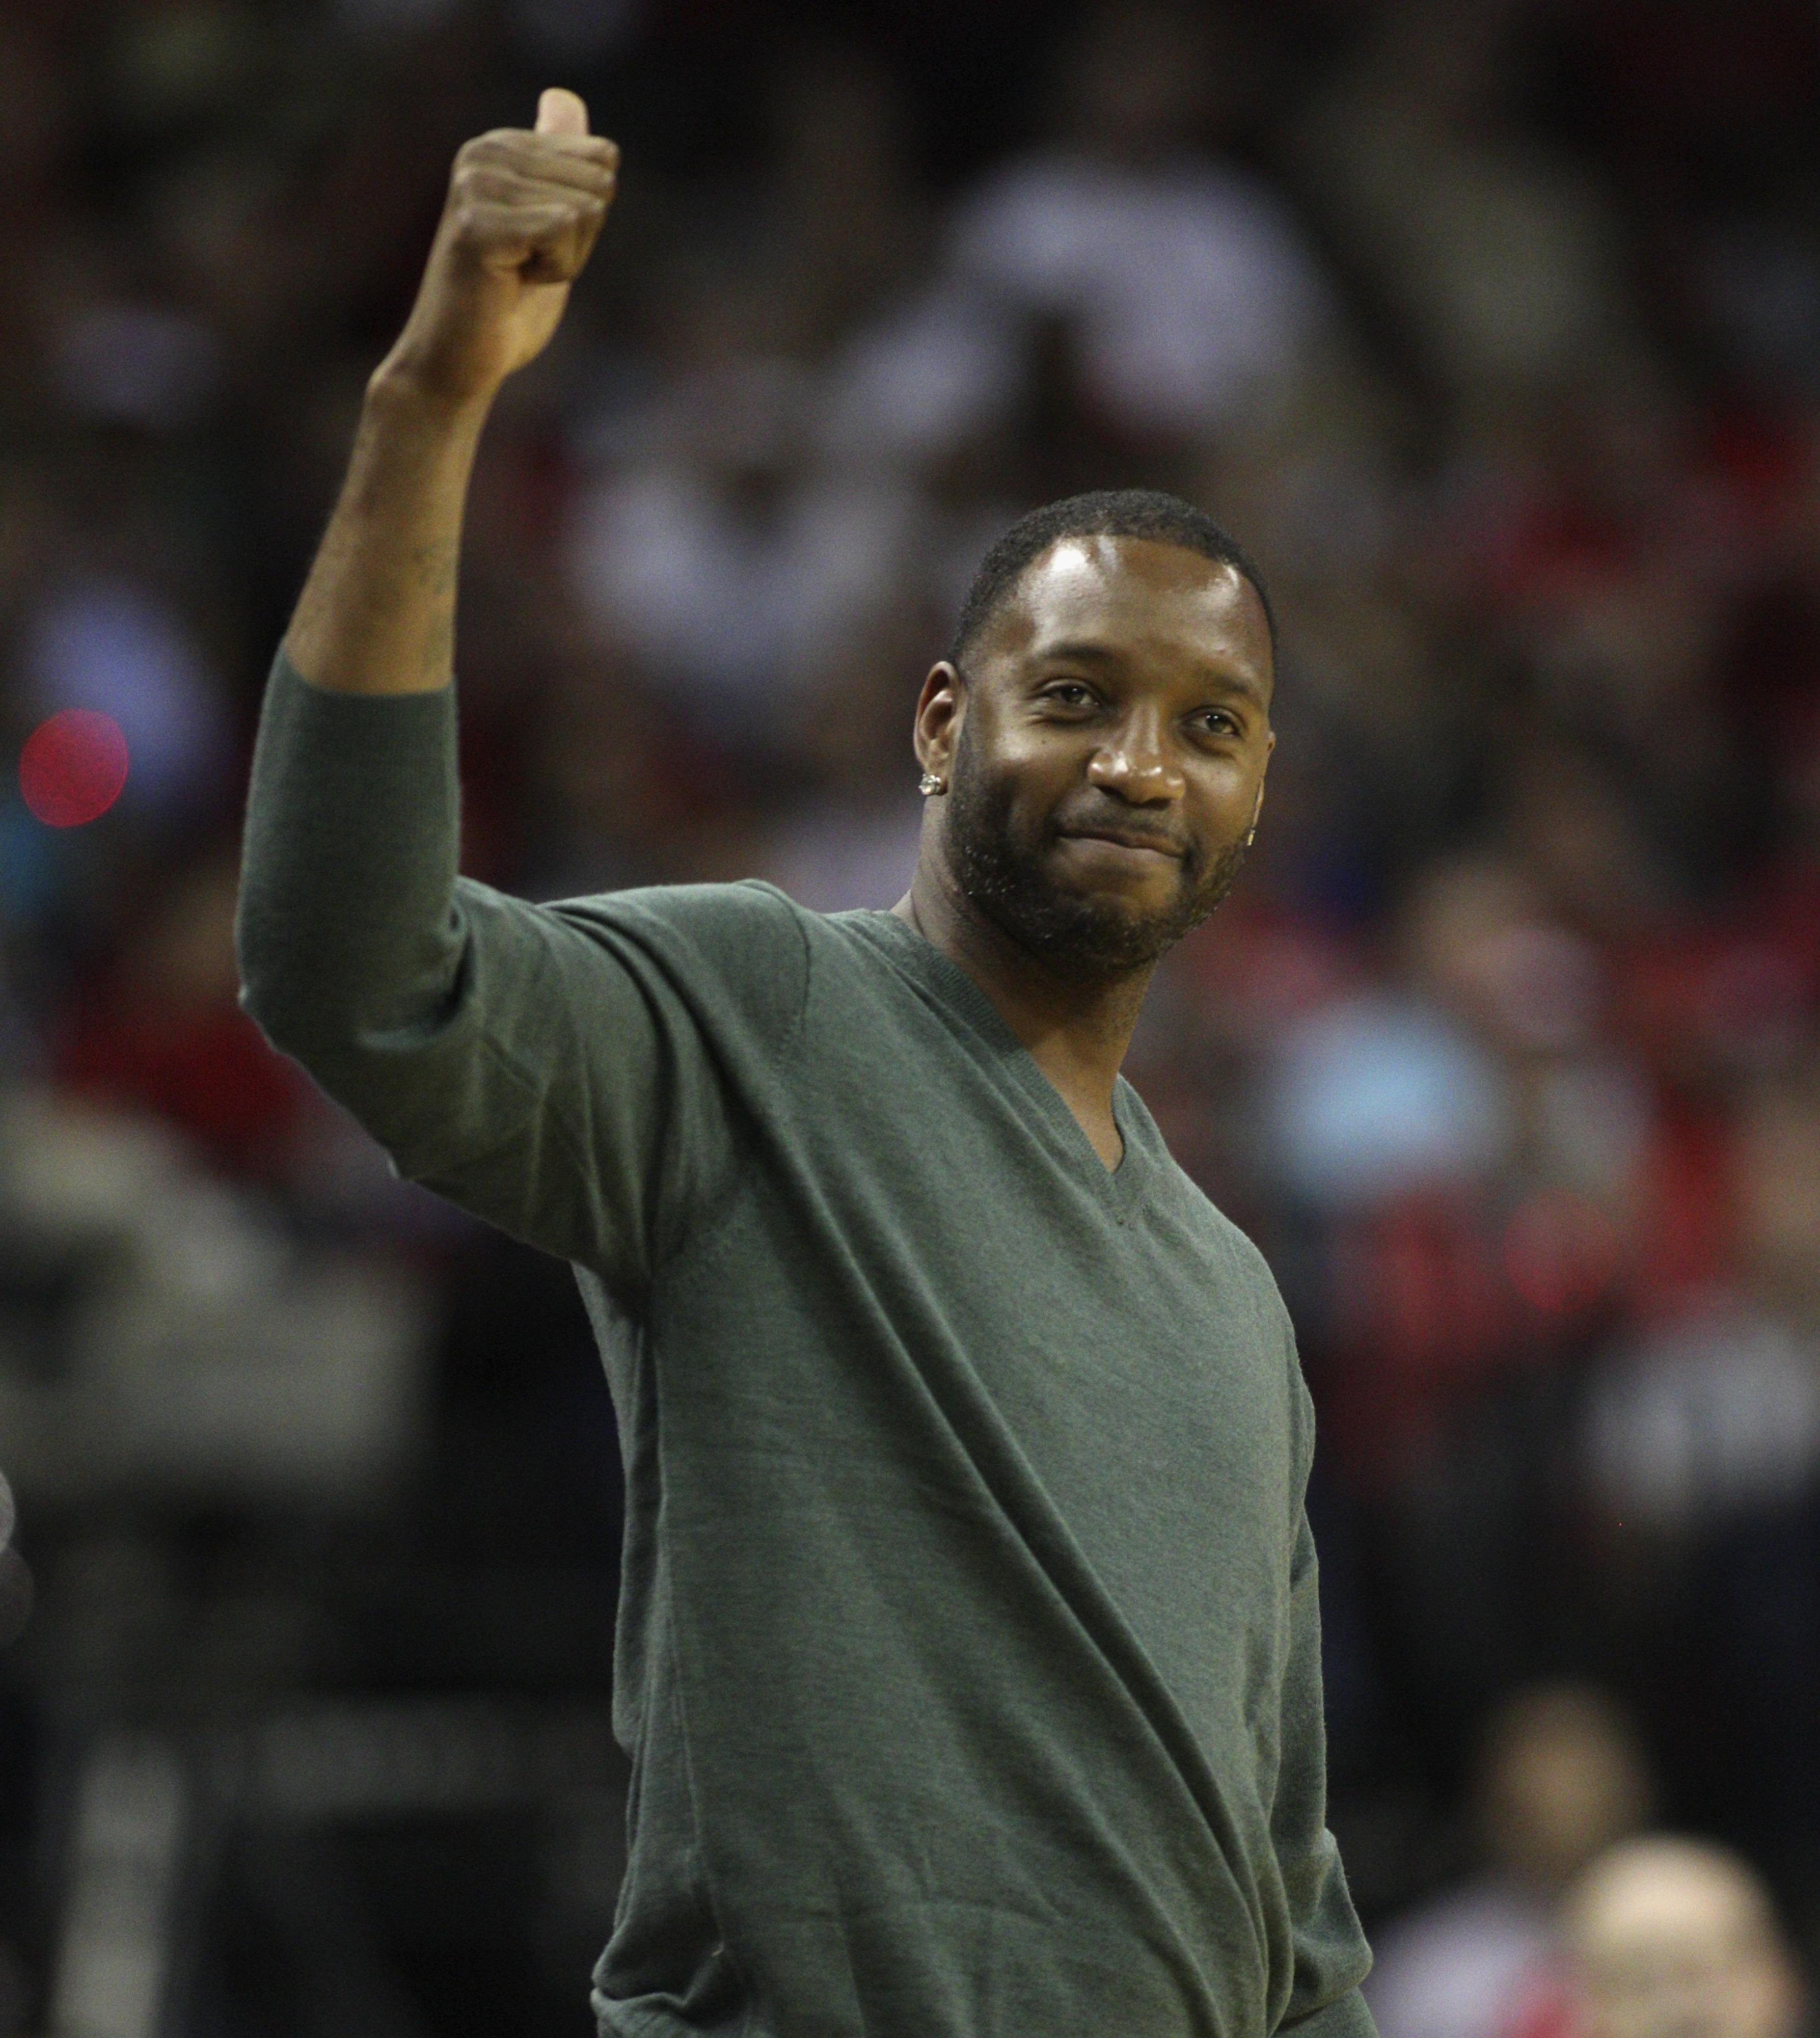 Tracy McGrady reportedly plotting NBA comeback